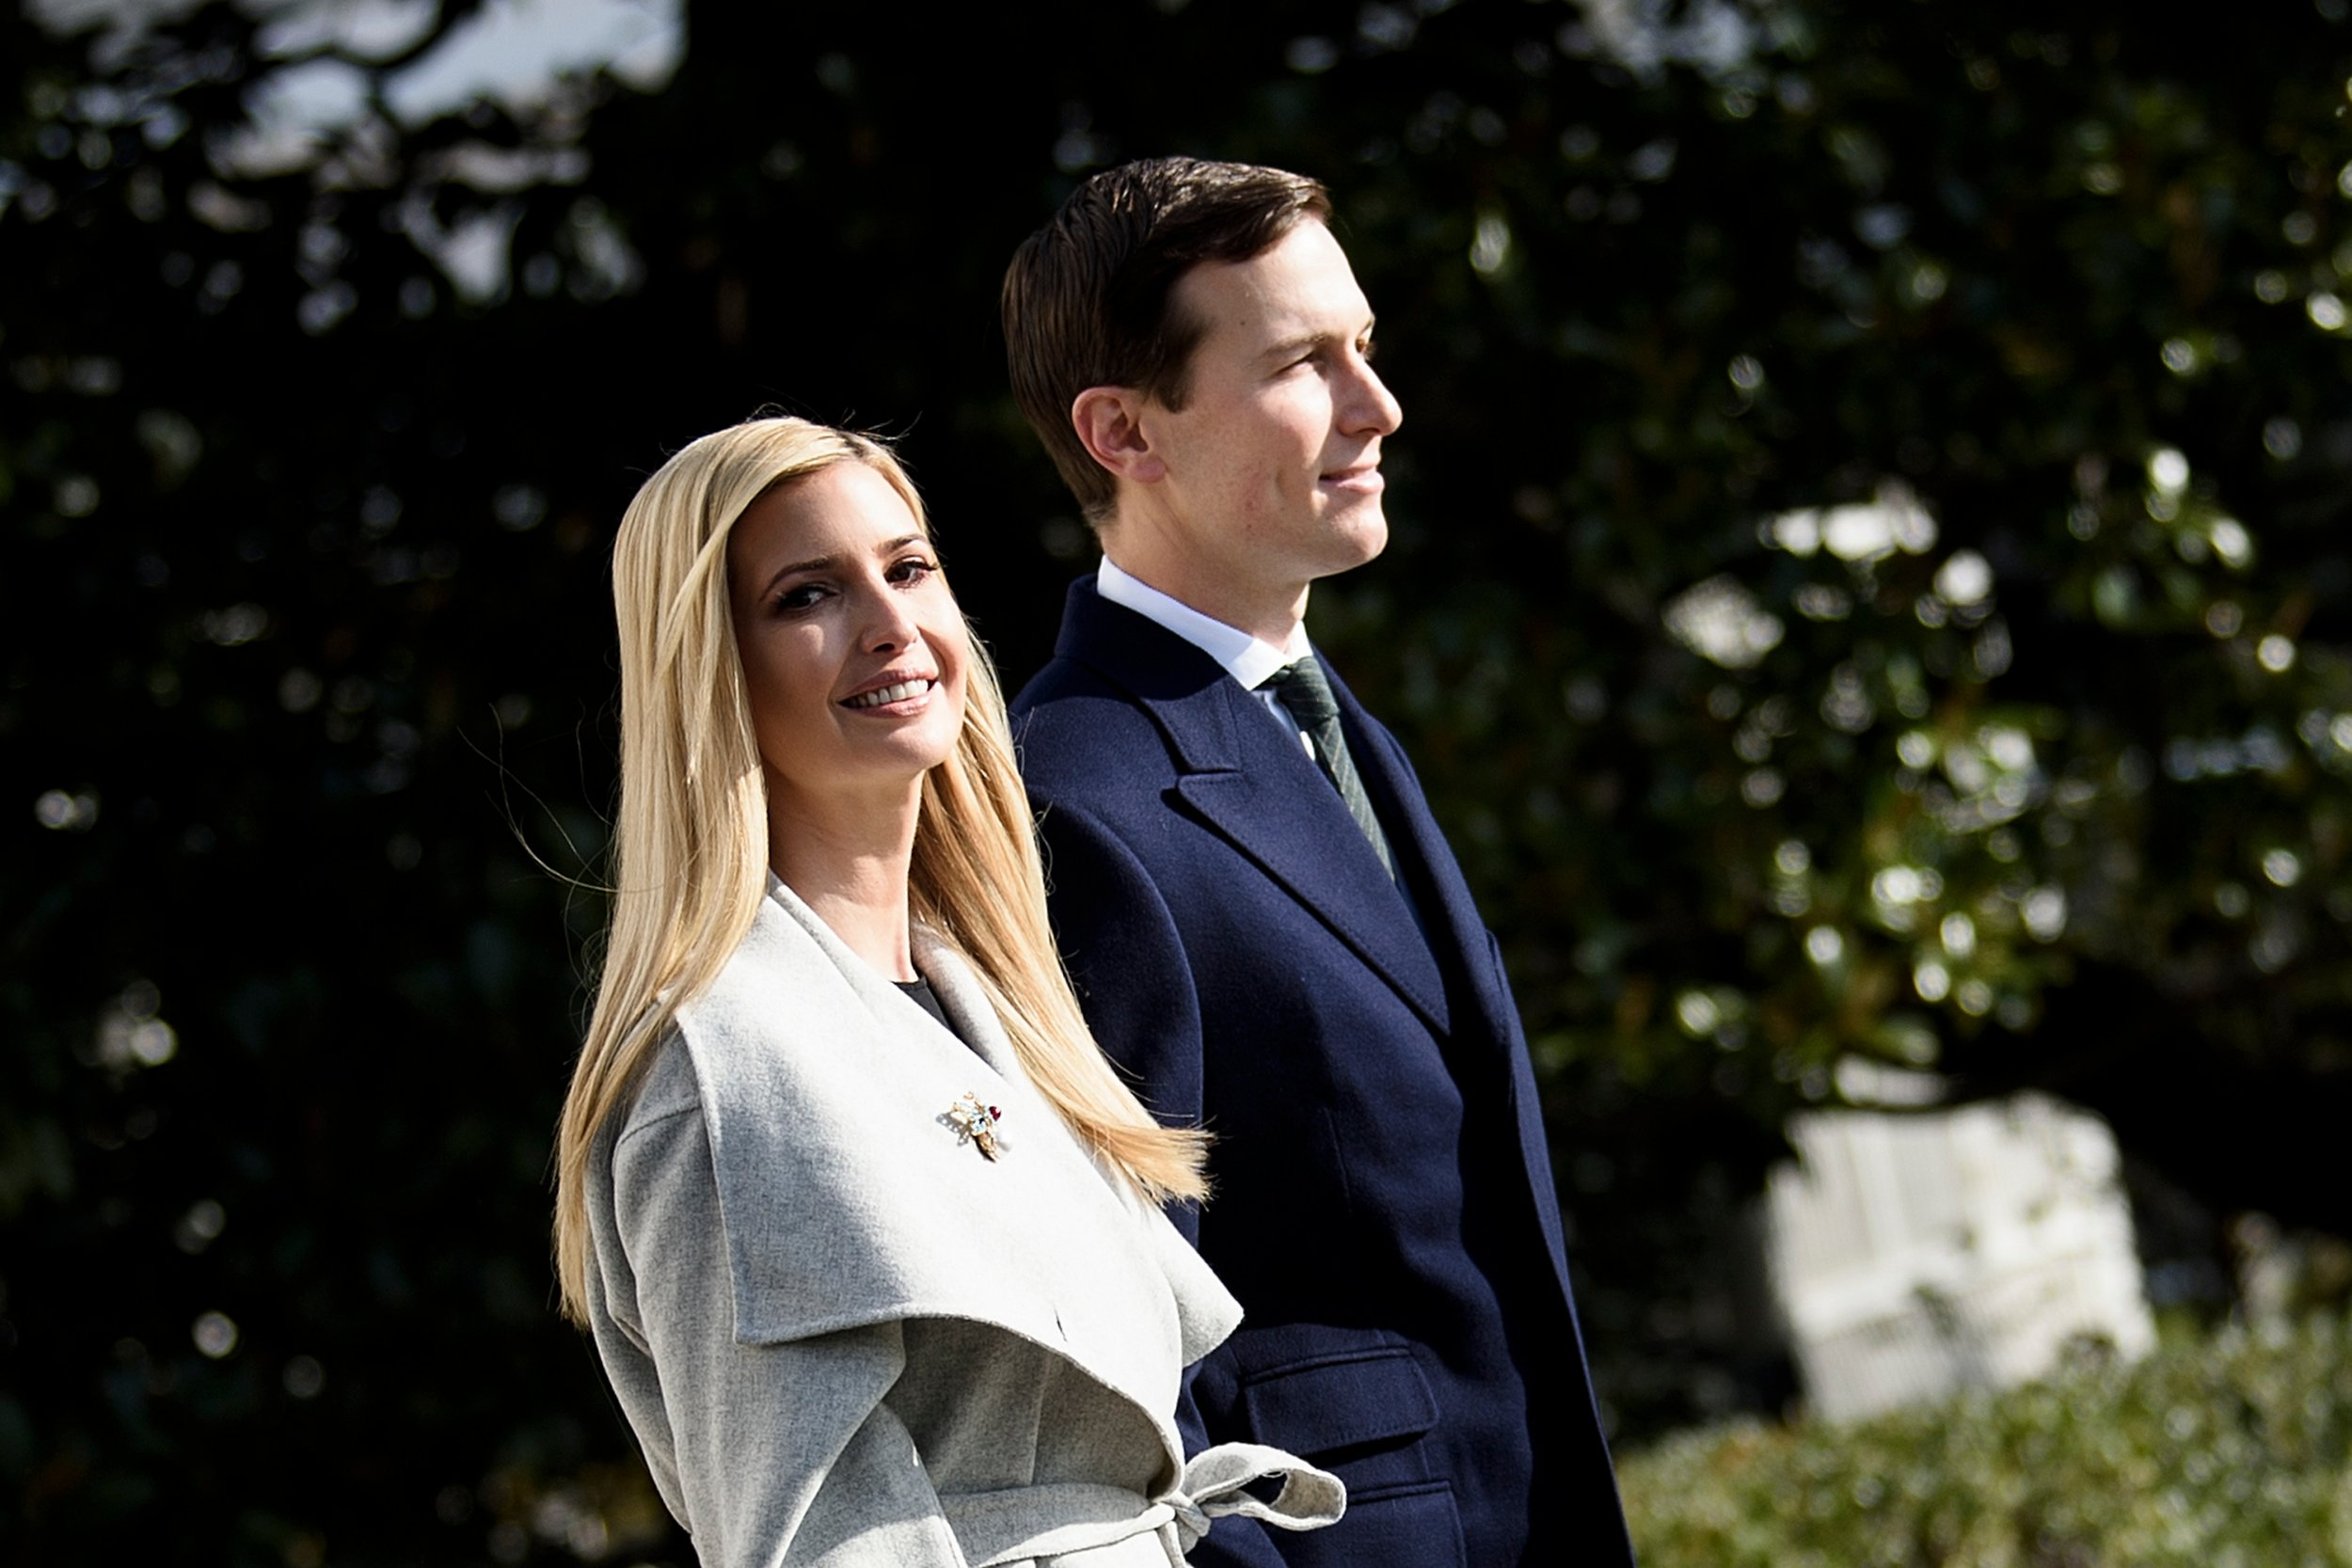 Ivanka Jared Kushner Donald Trump Chris Christie investigation